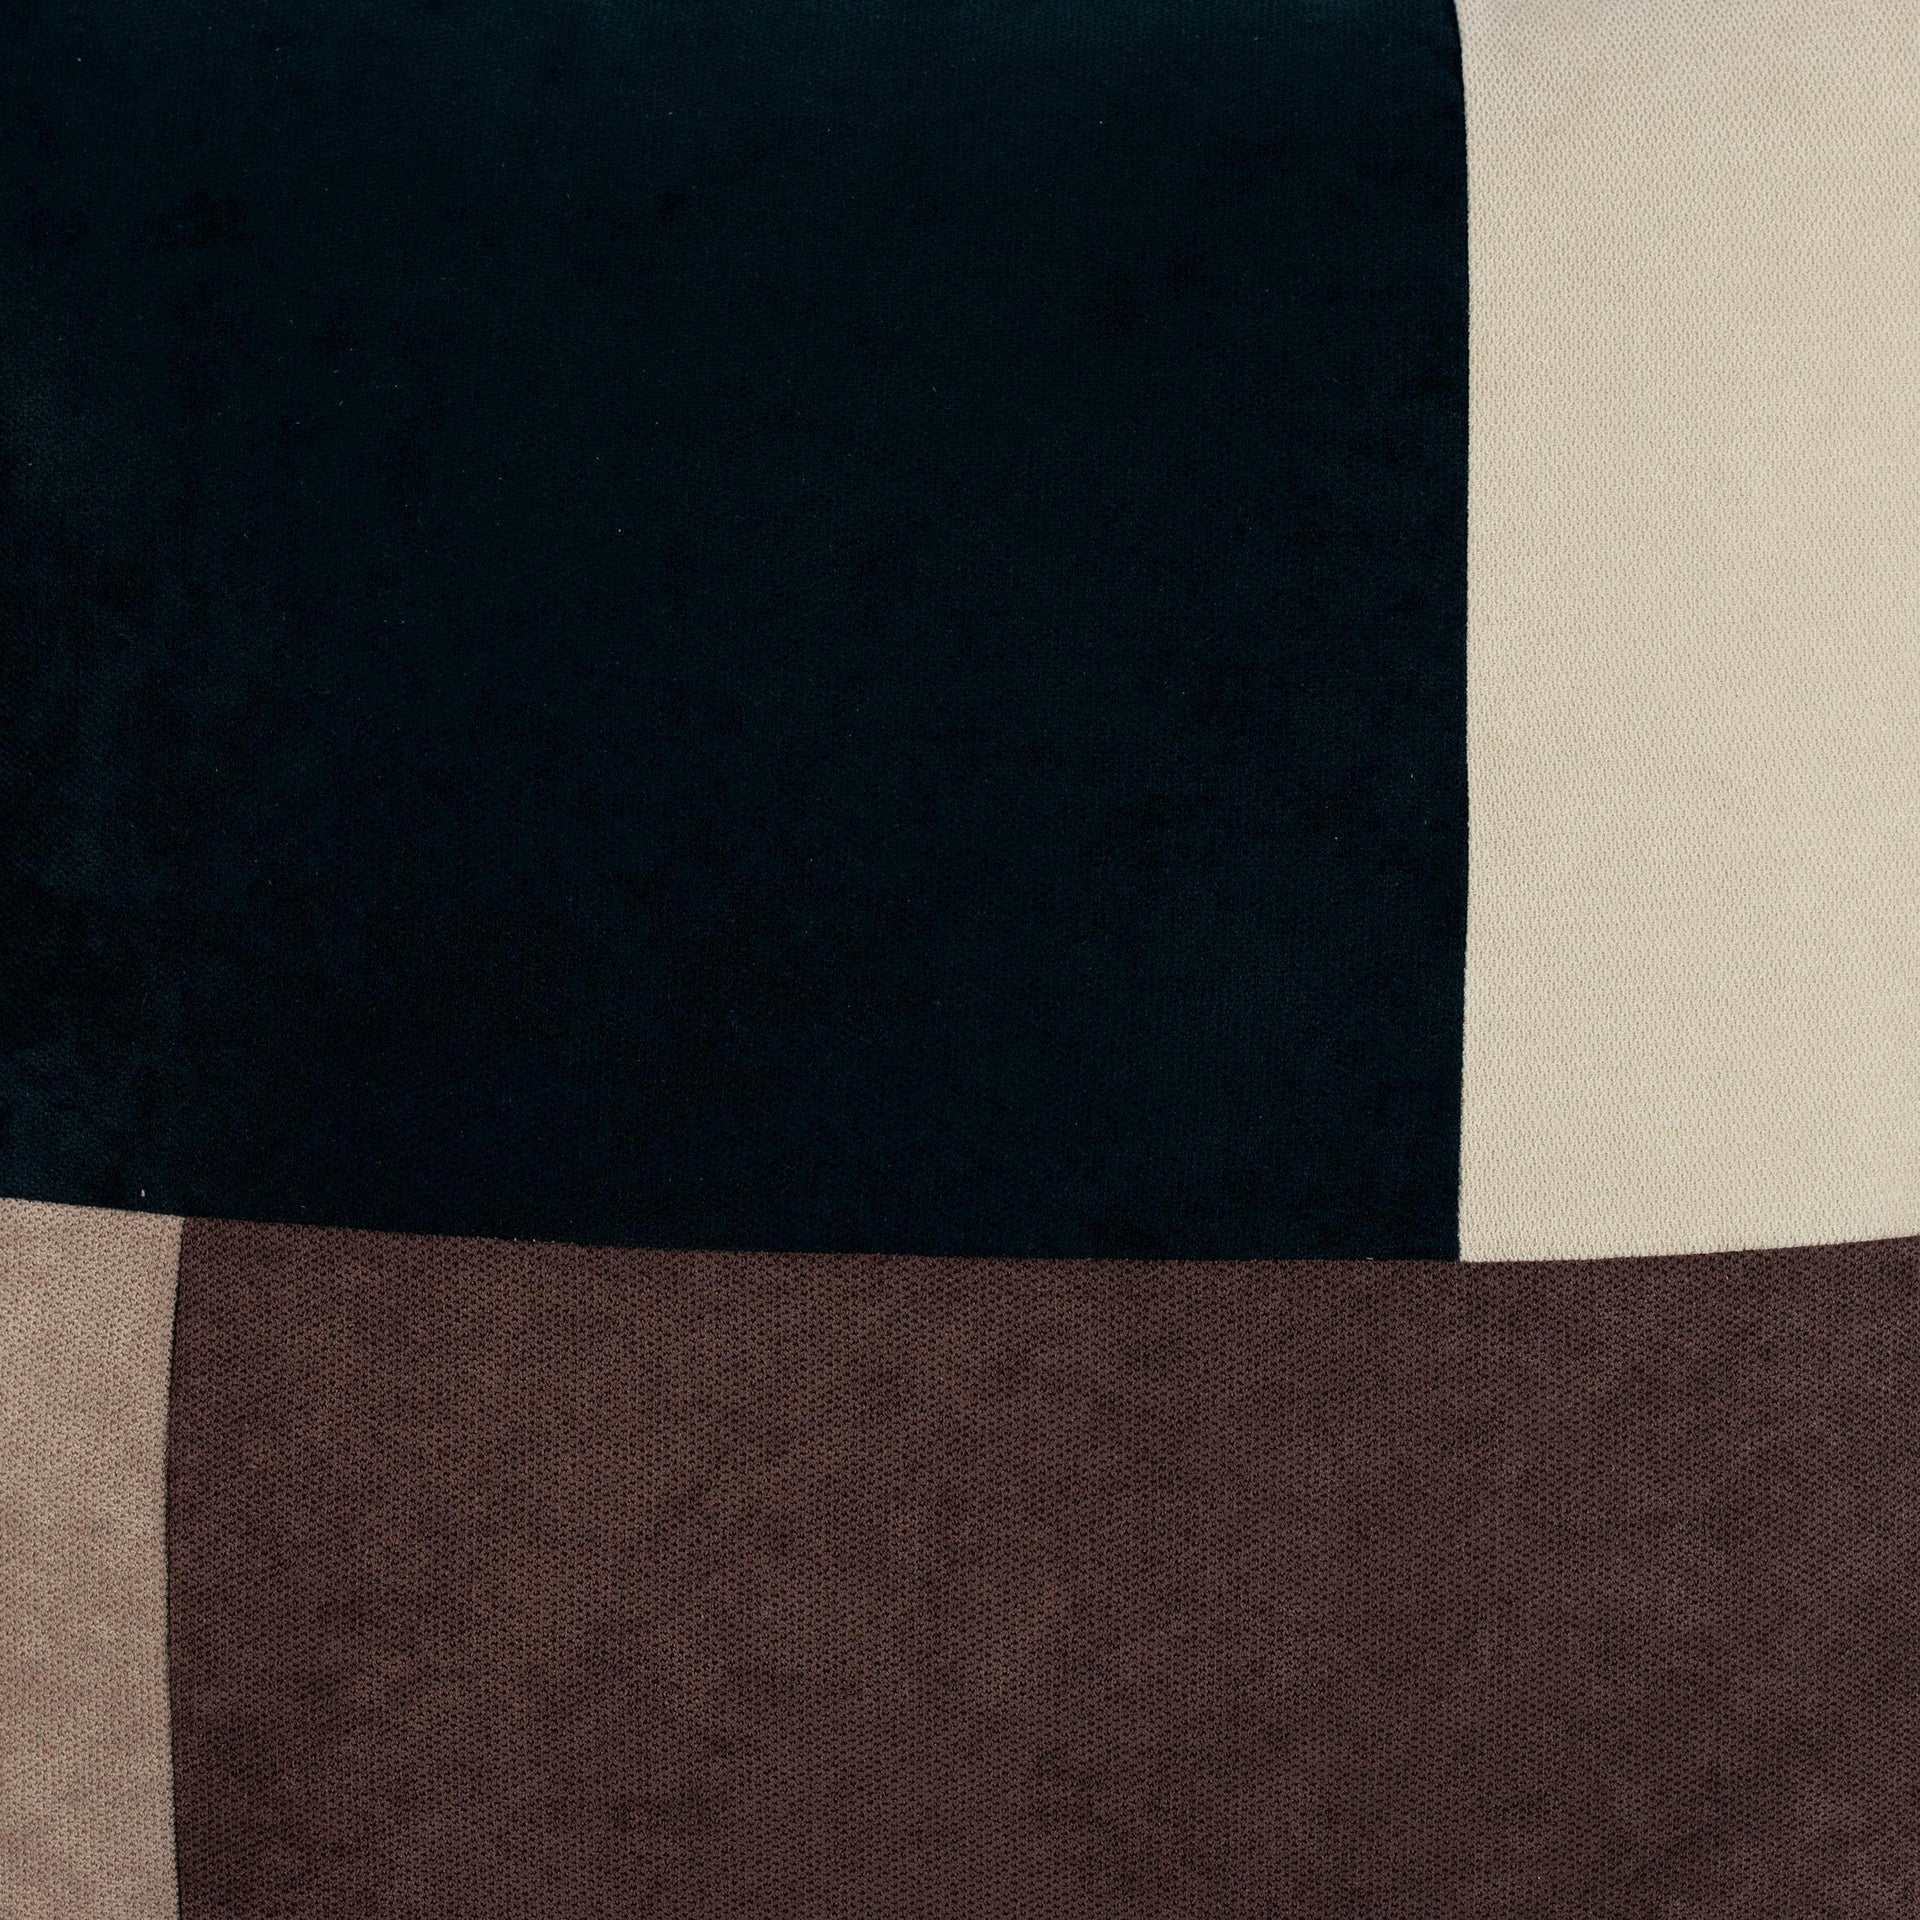 Cuscino Patchwork marrone 60x60 cm - 3